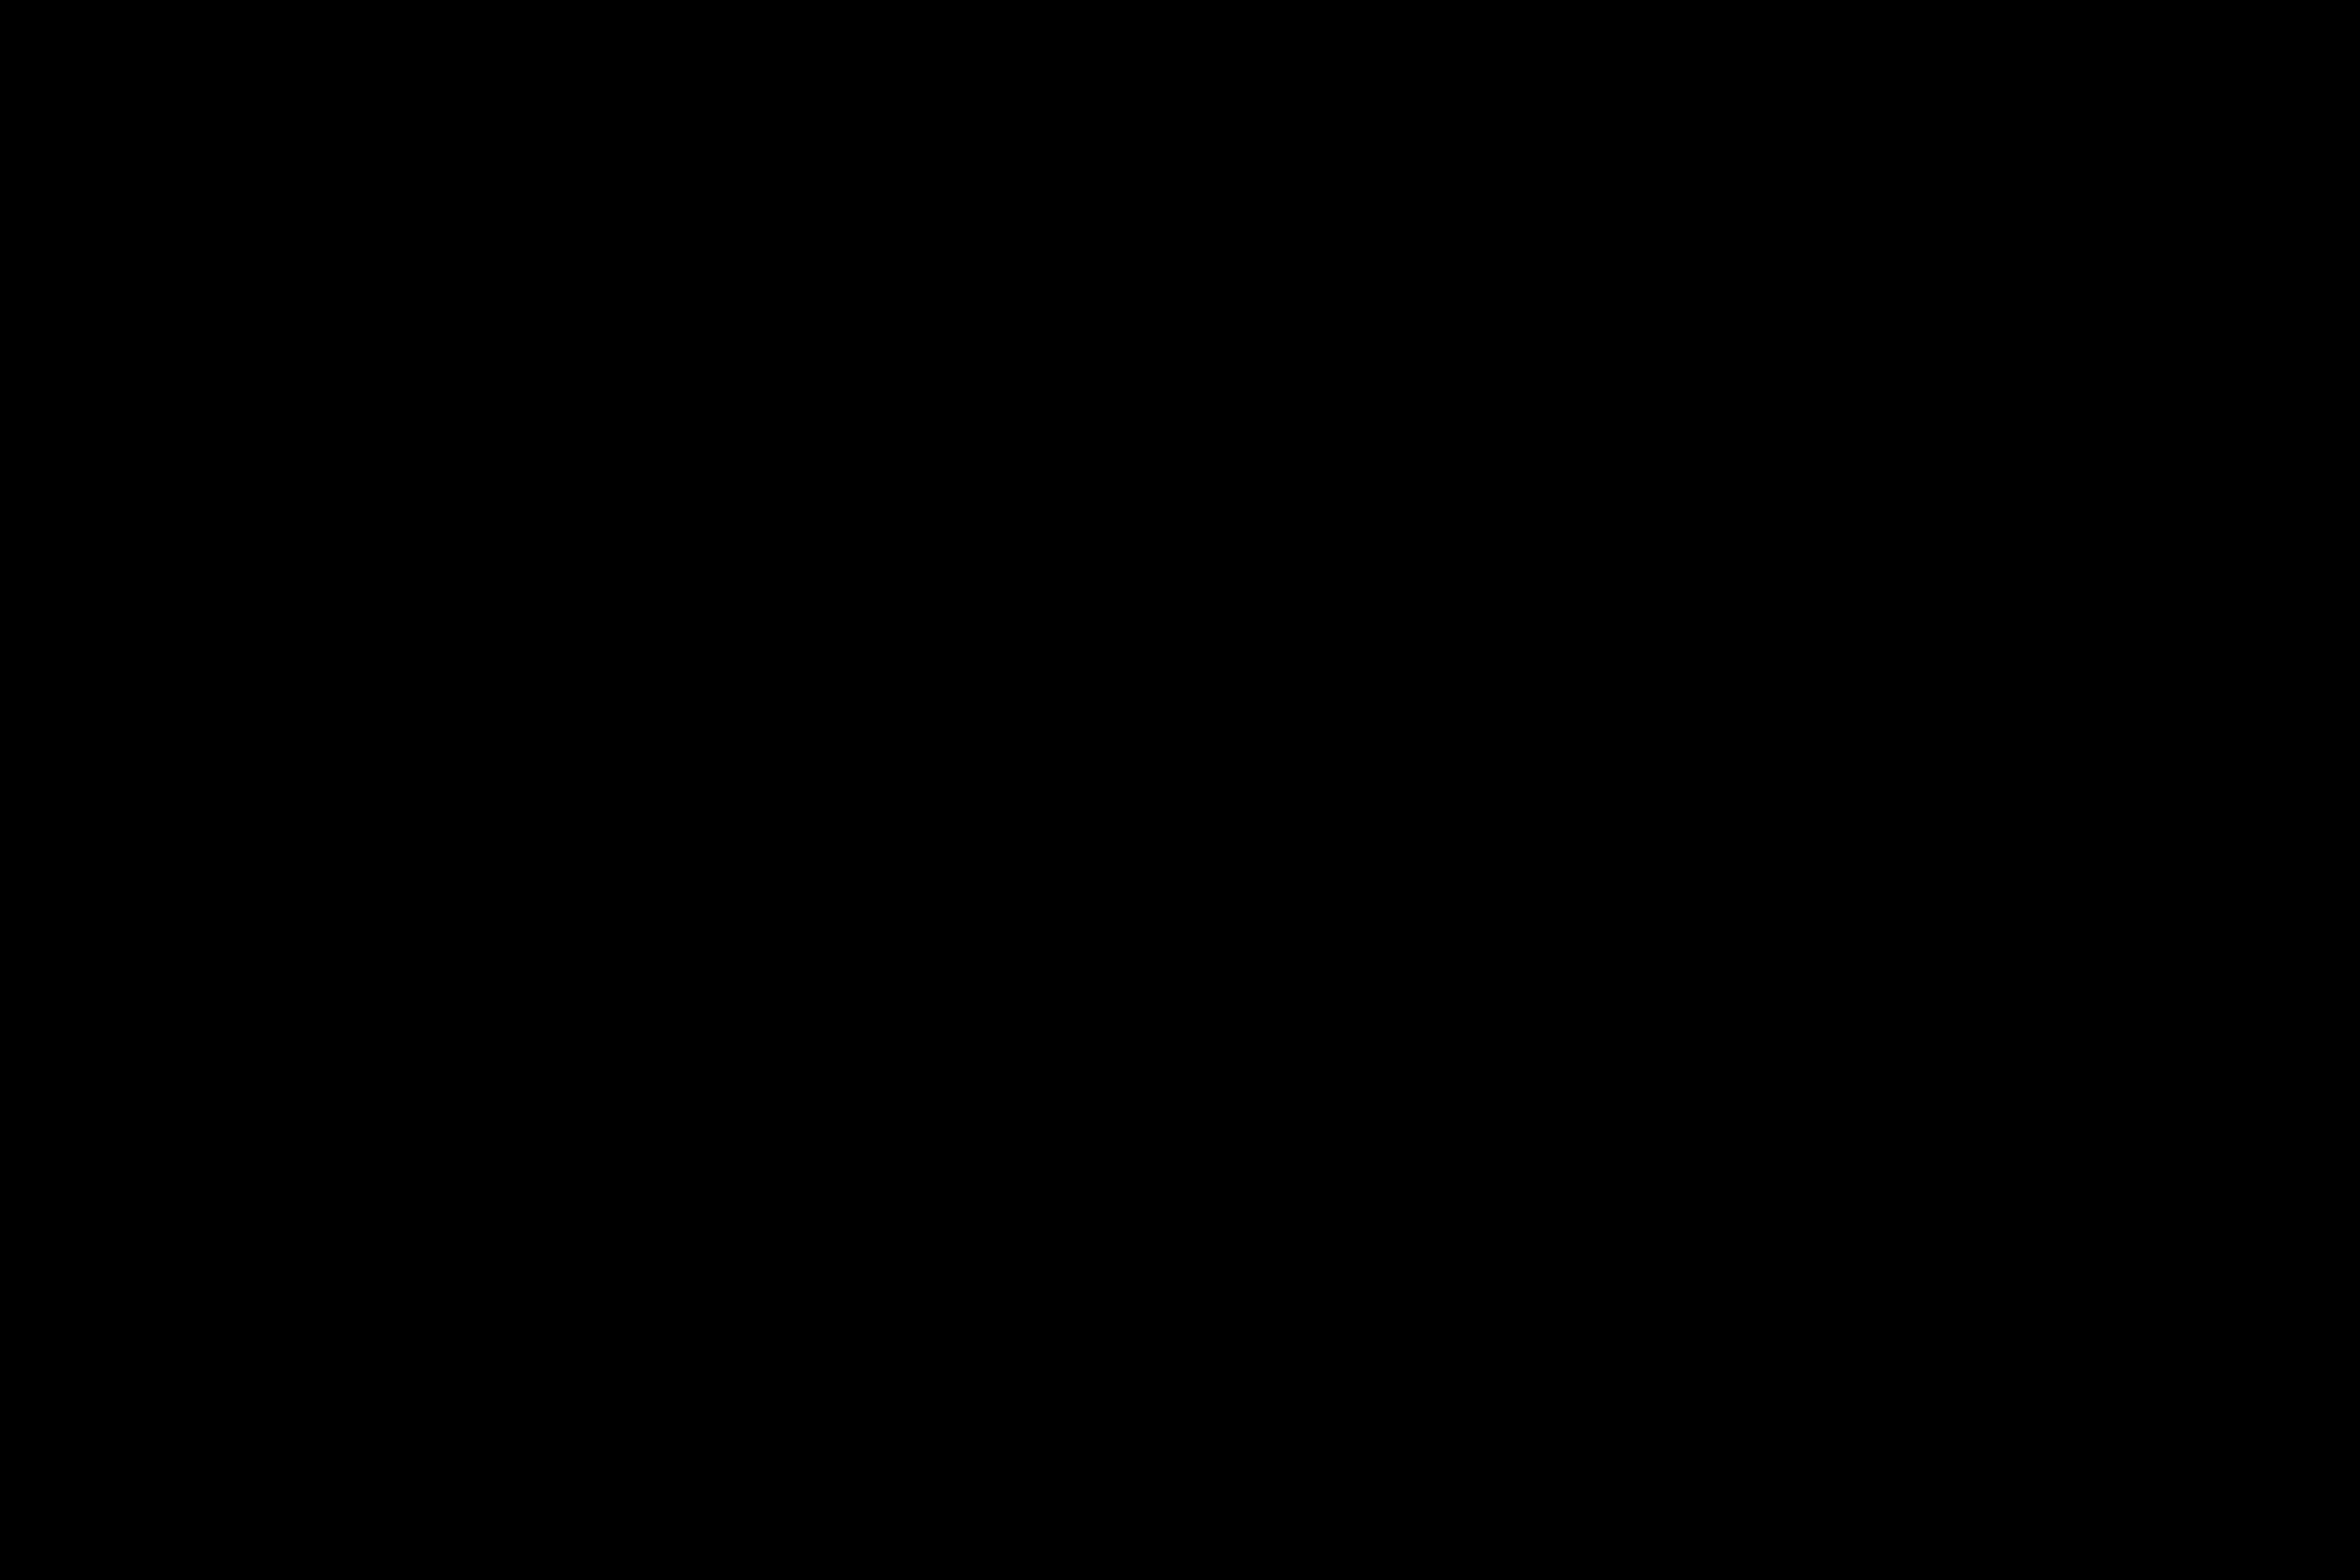 Kallistia-Bilinsky-Black-High-Resc.png